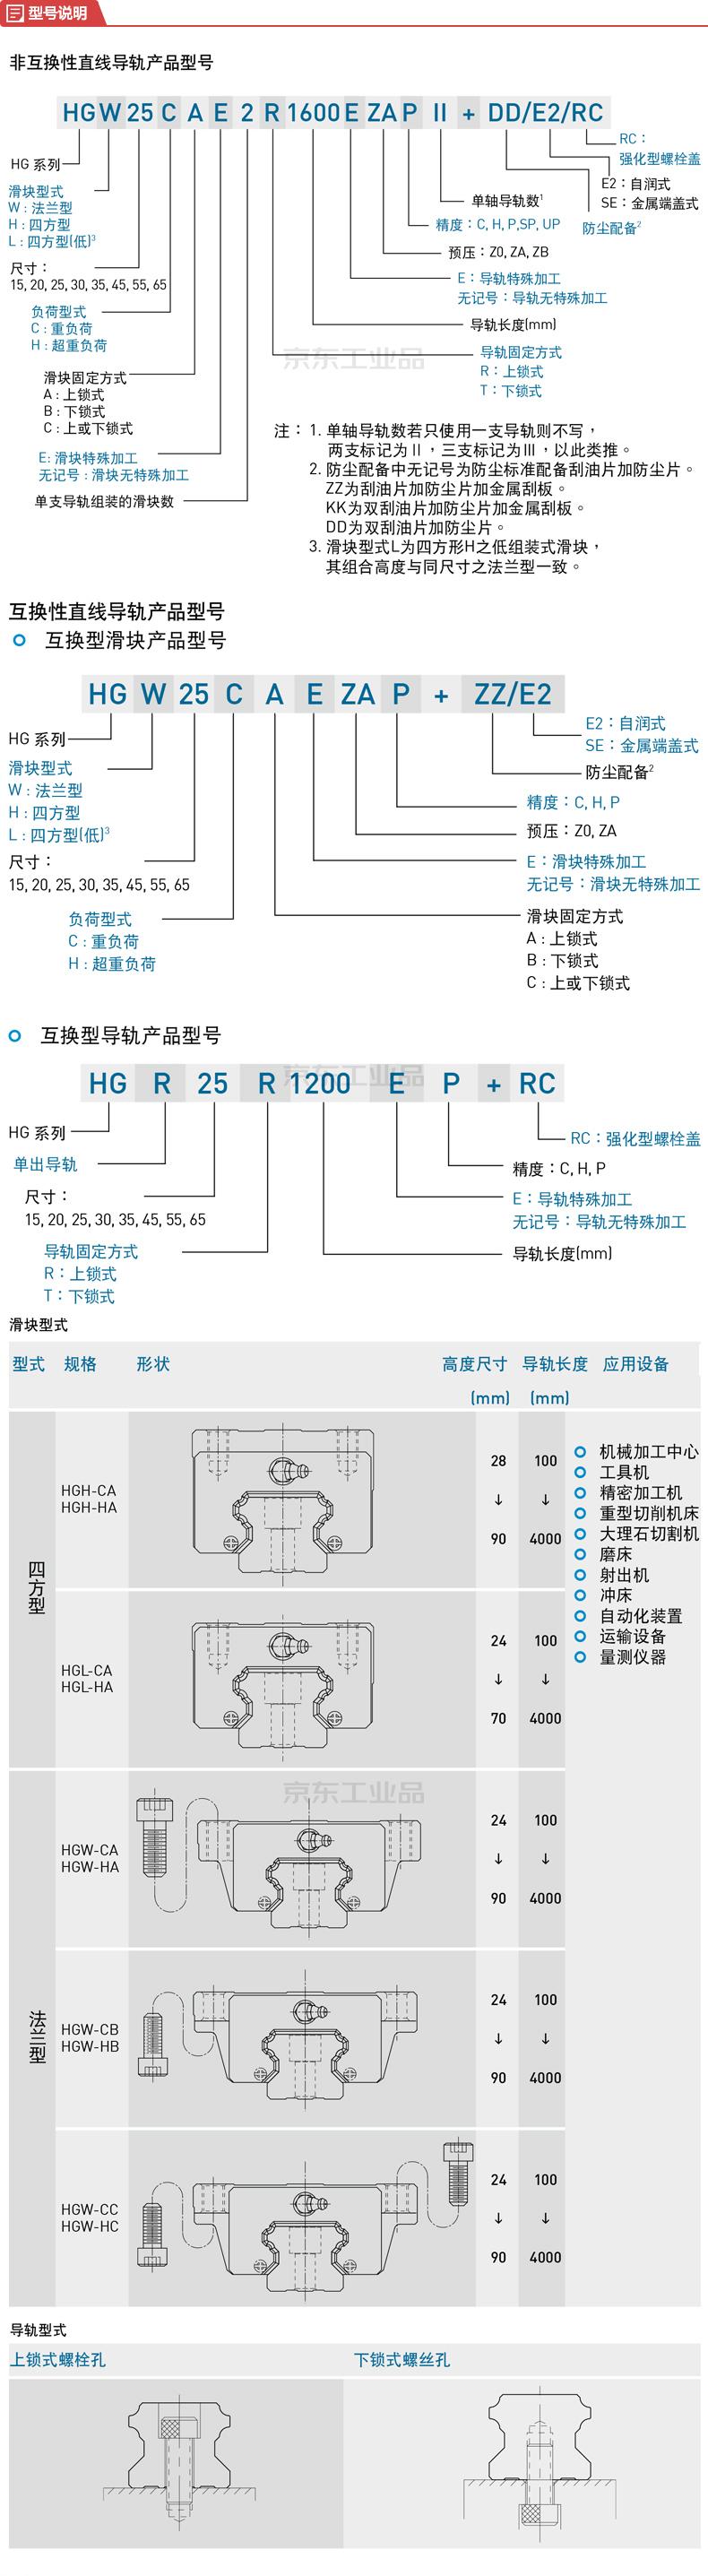 HIWIN(上银) HG系列非互换性直线导轨;HGH20CA1R640ZAC